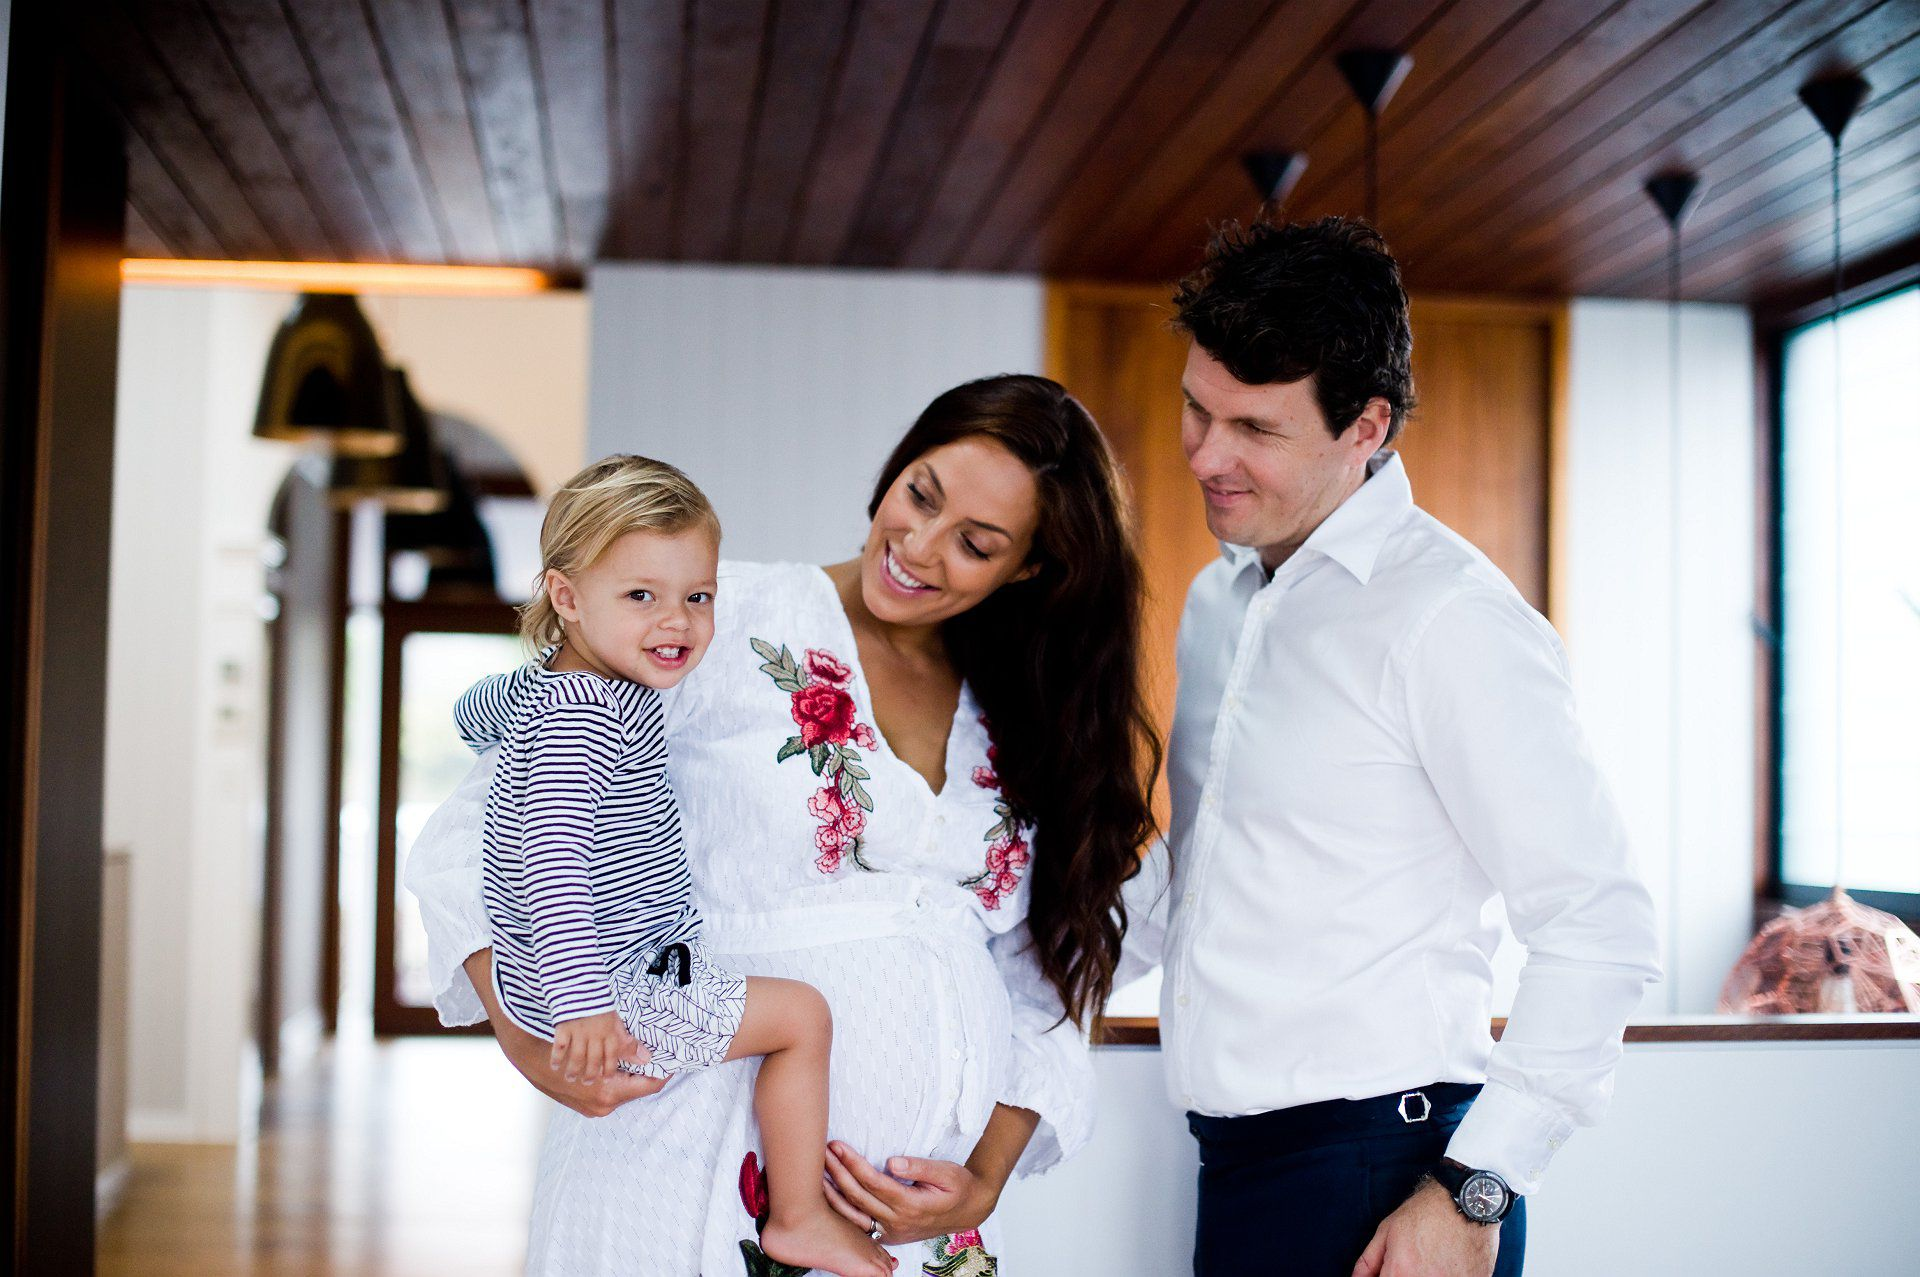 paddington pregnancy photographer in your home